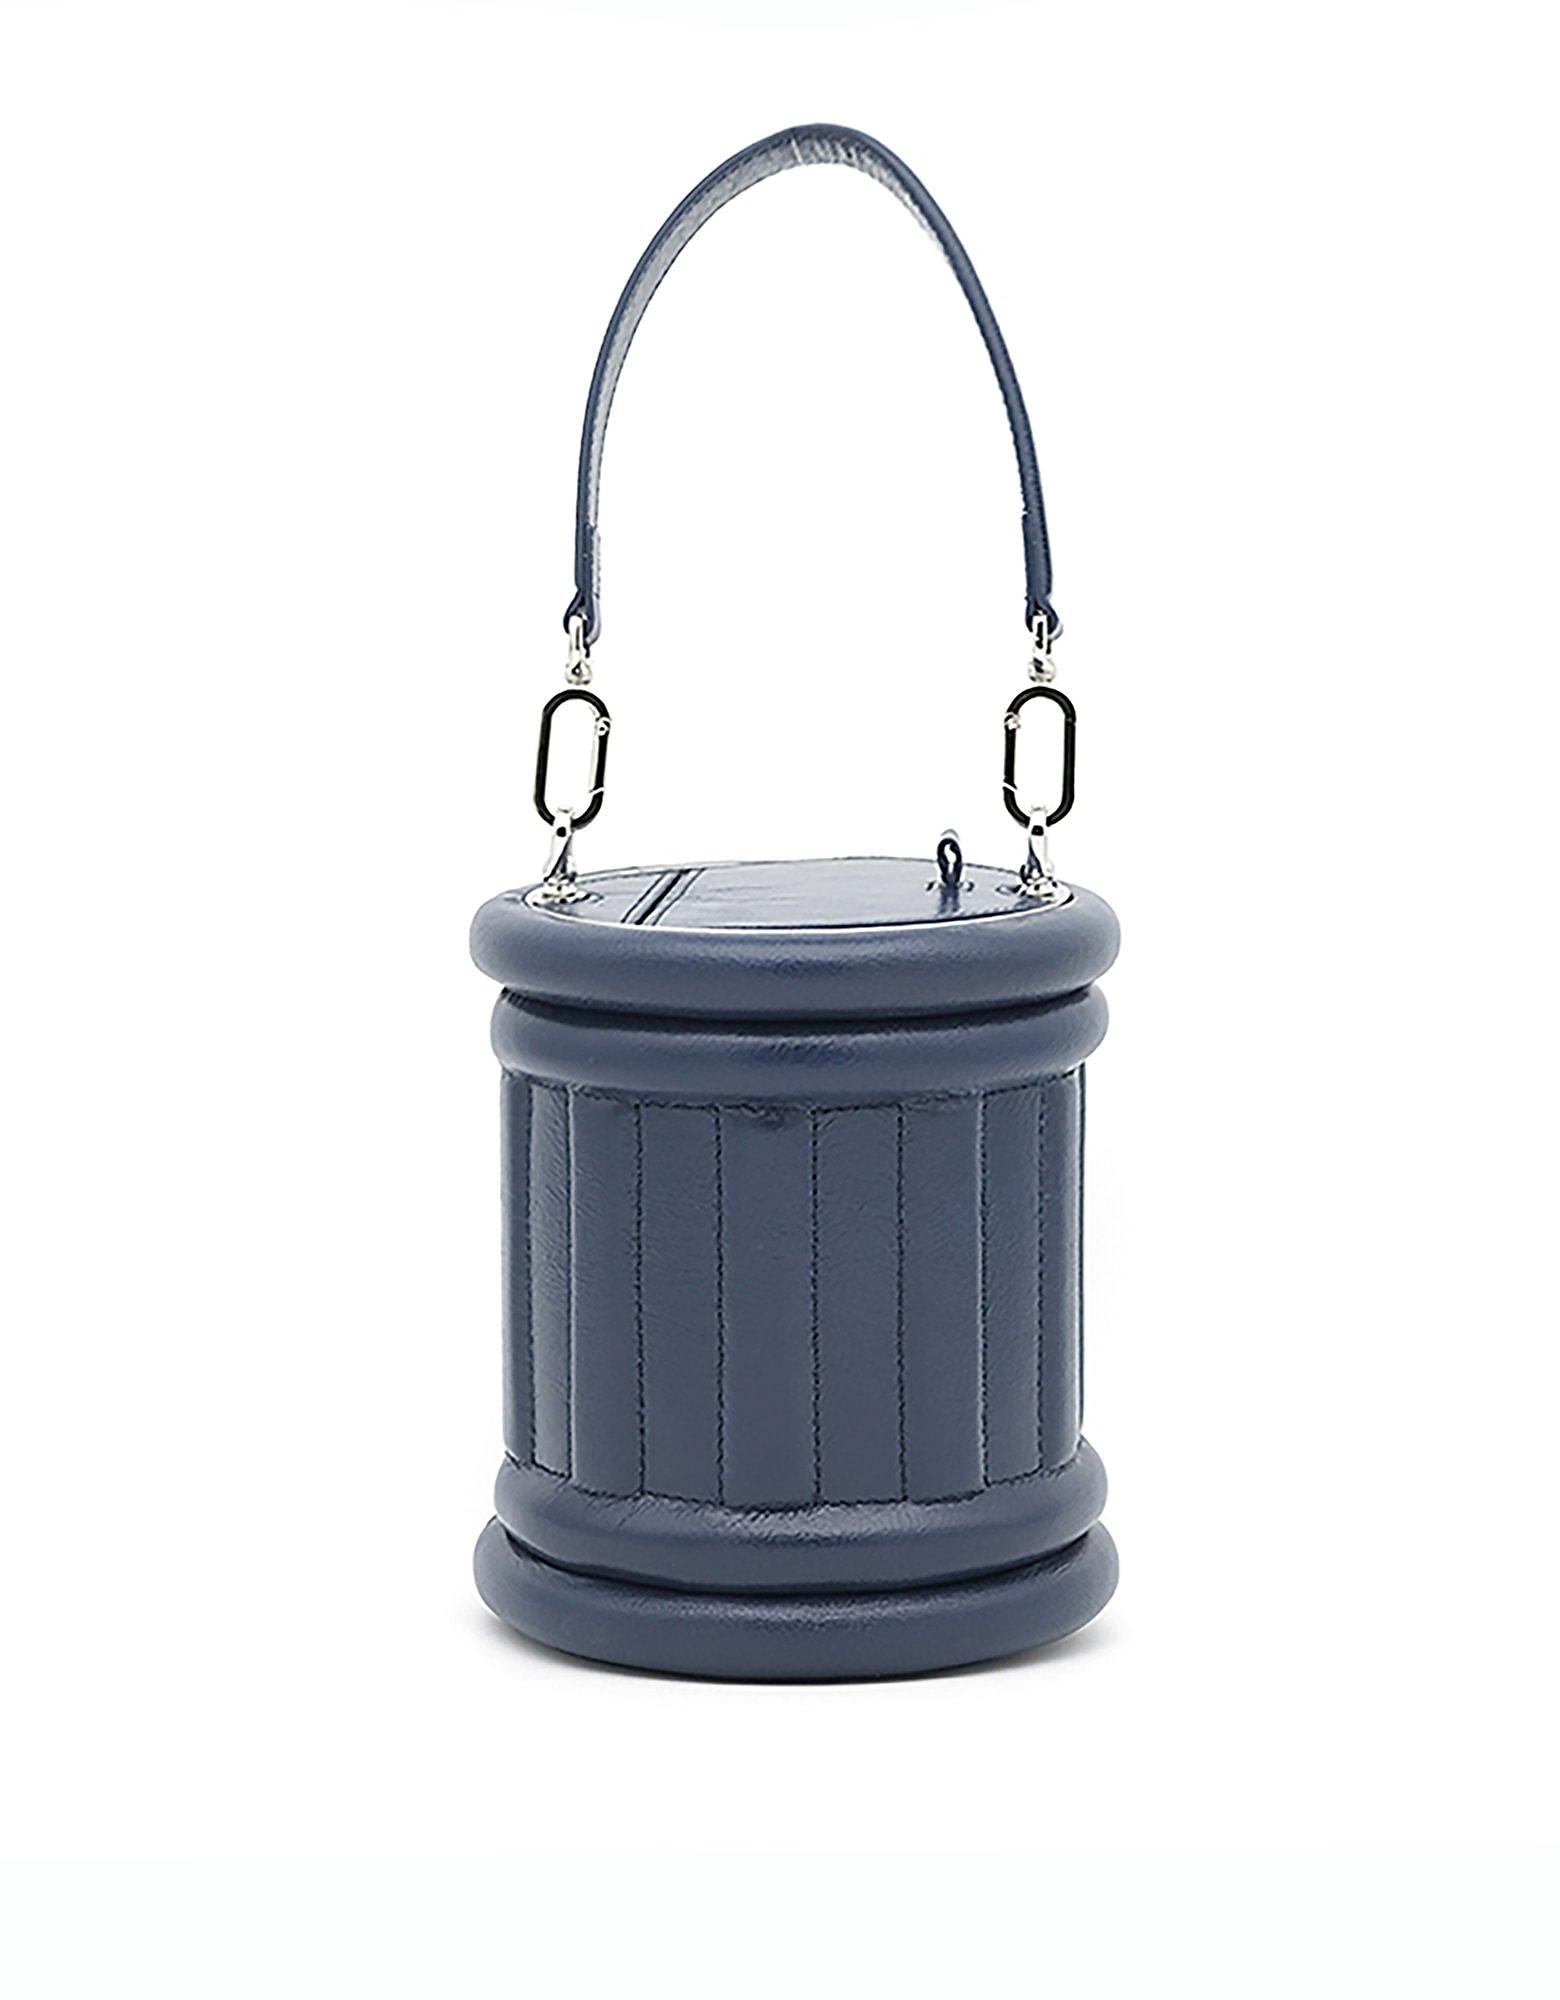 Forzieri coupon: A.Cloud  Handbags Roman Column Doric Bucket Bag